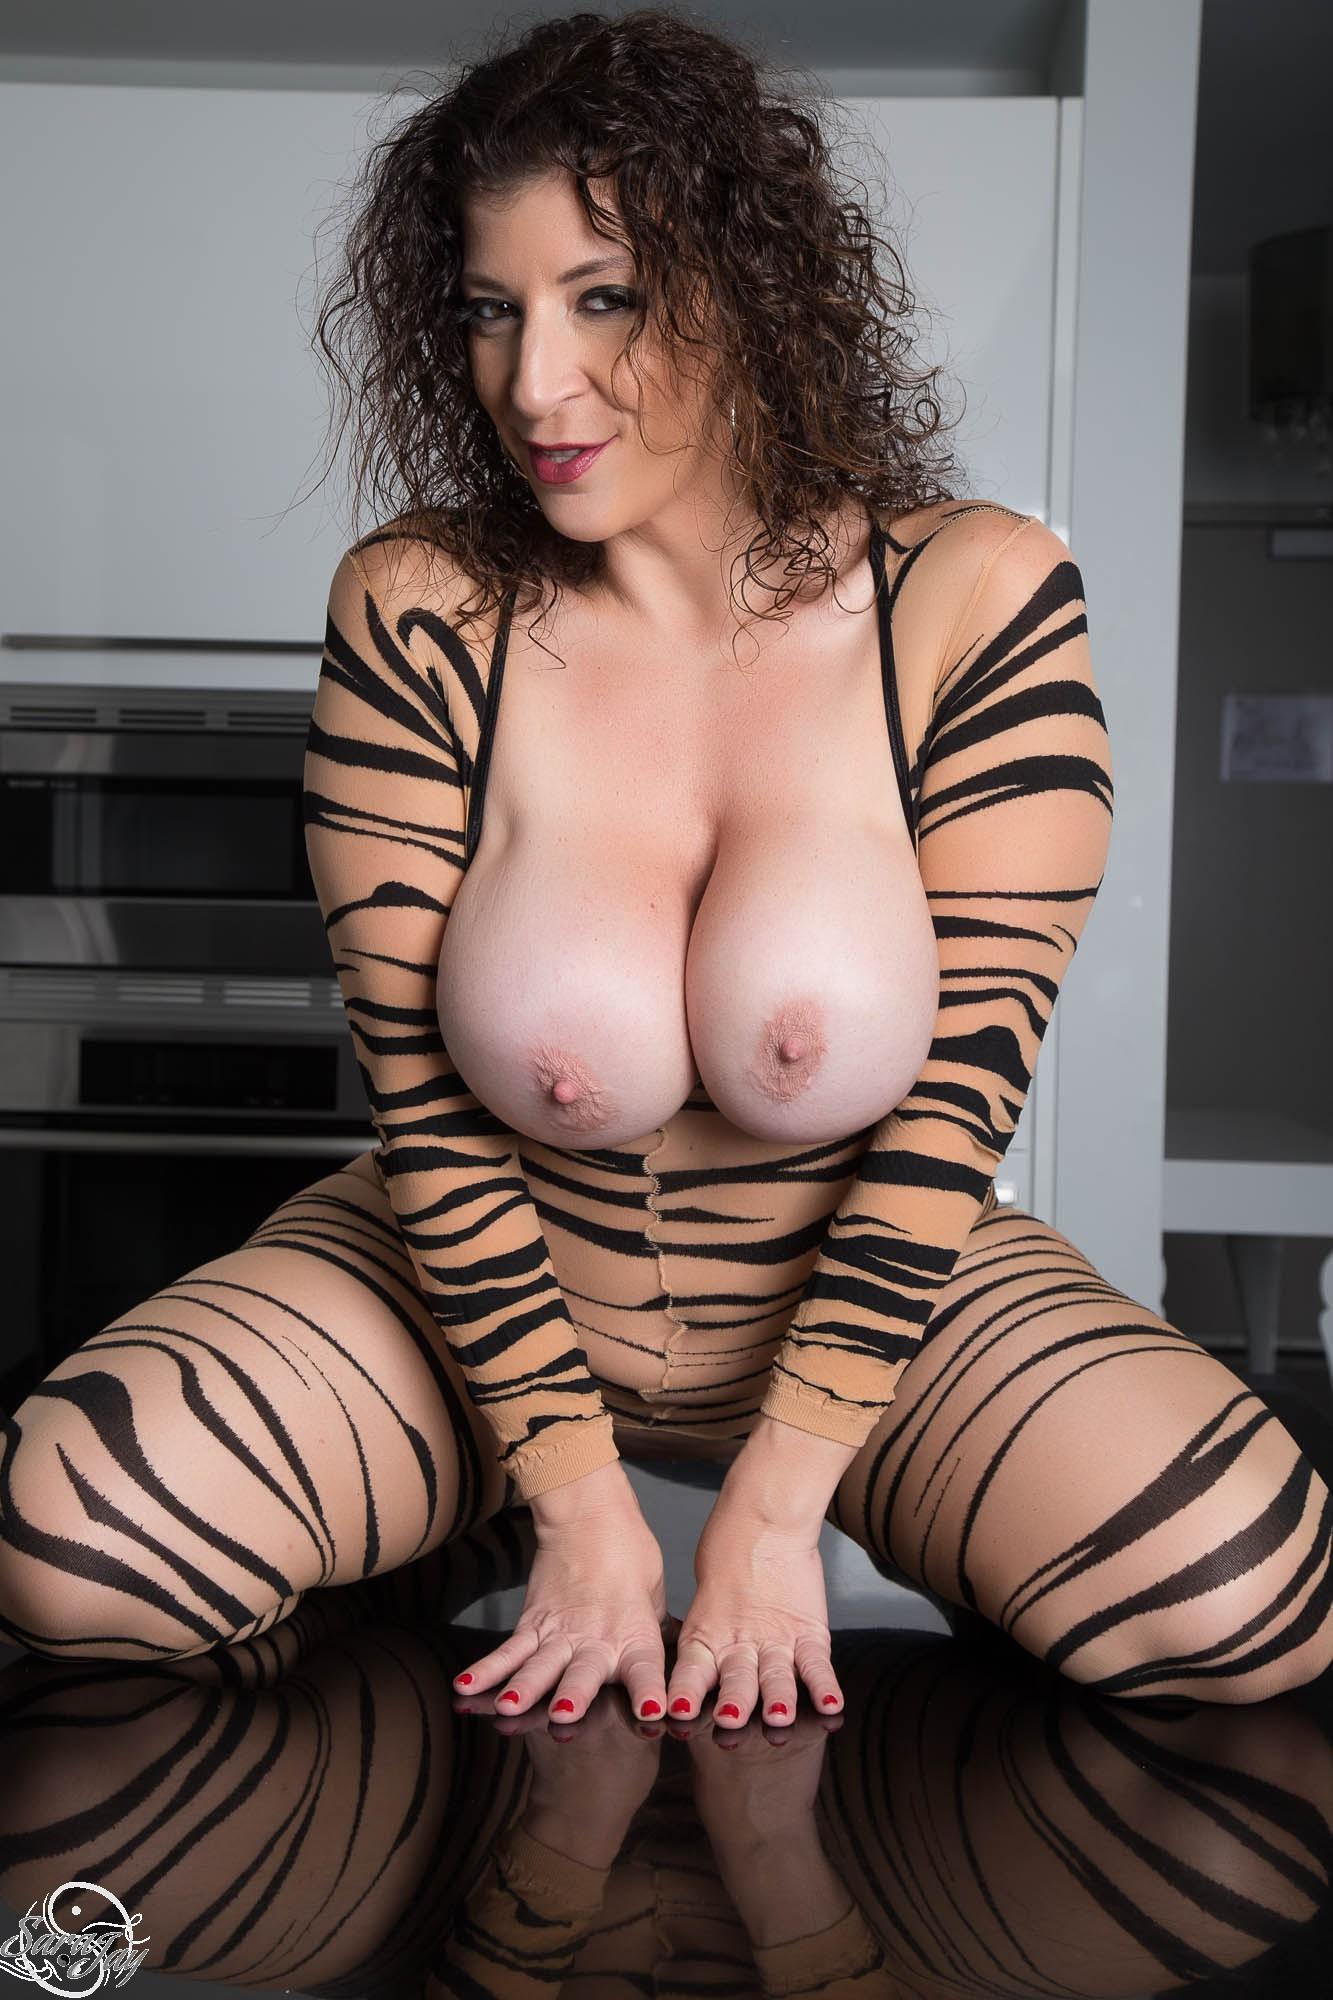 Sara jay topless nude (93 photos), Tits Celebrites image